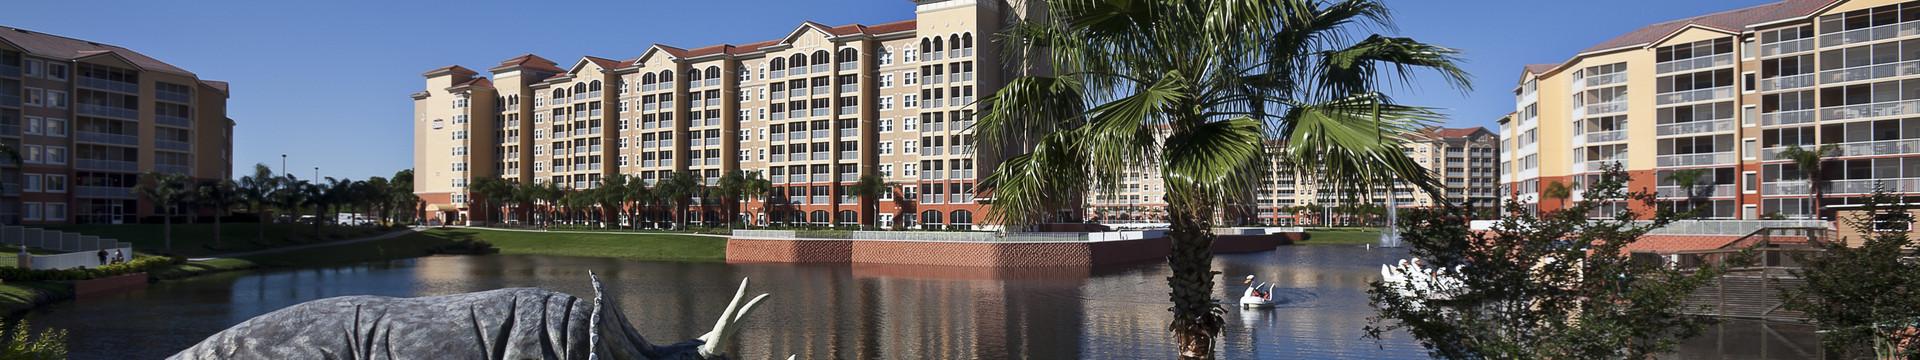 Mini golf in Orlando Florida at our resort | Westgate Lakes Resort & Spa